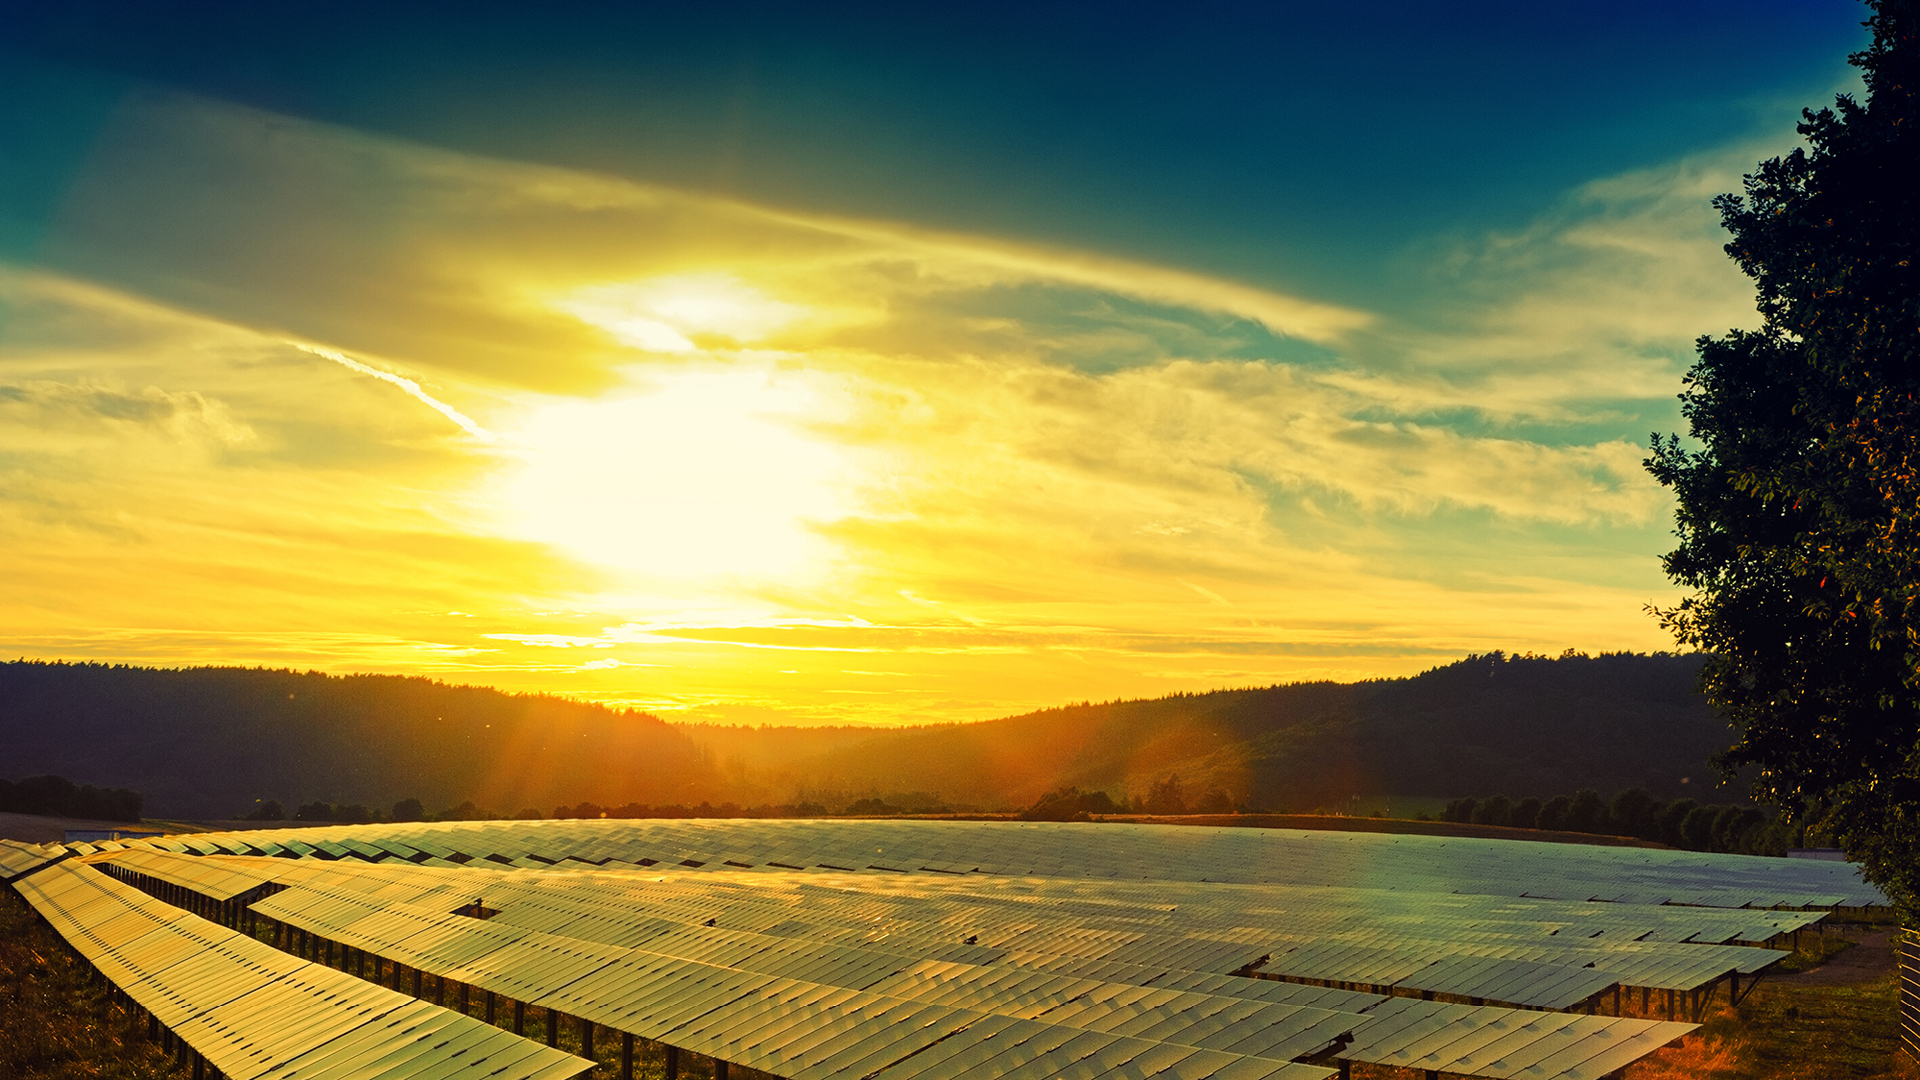 Sunrise solar panel